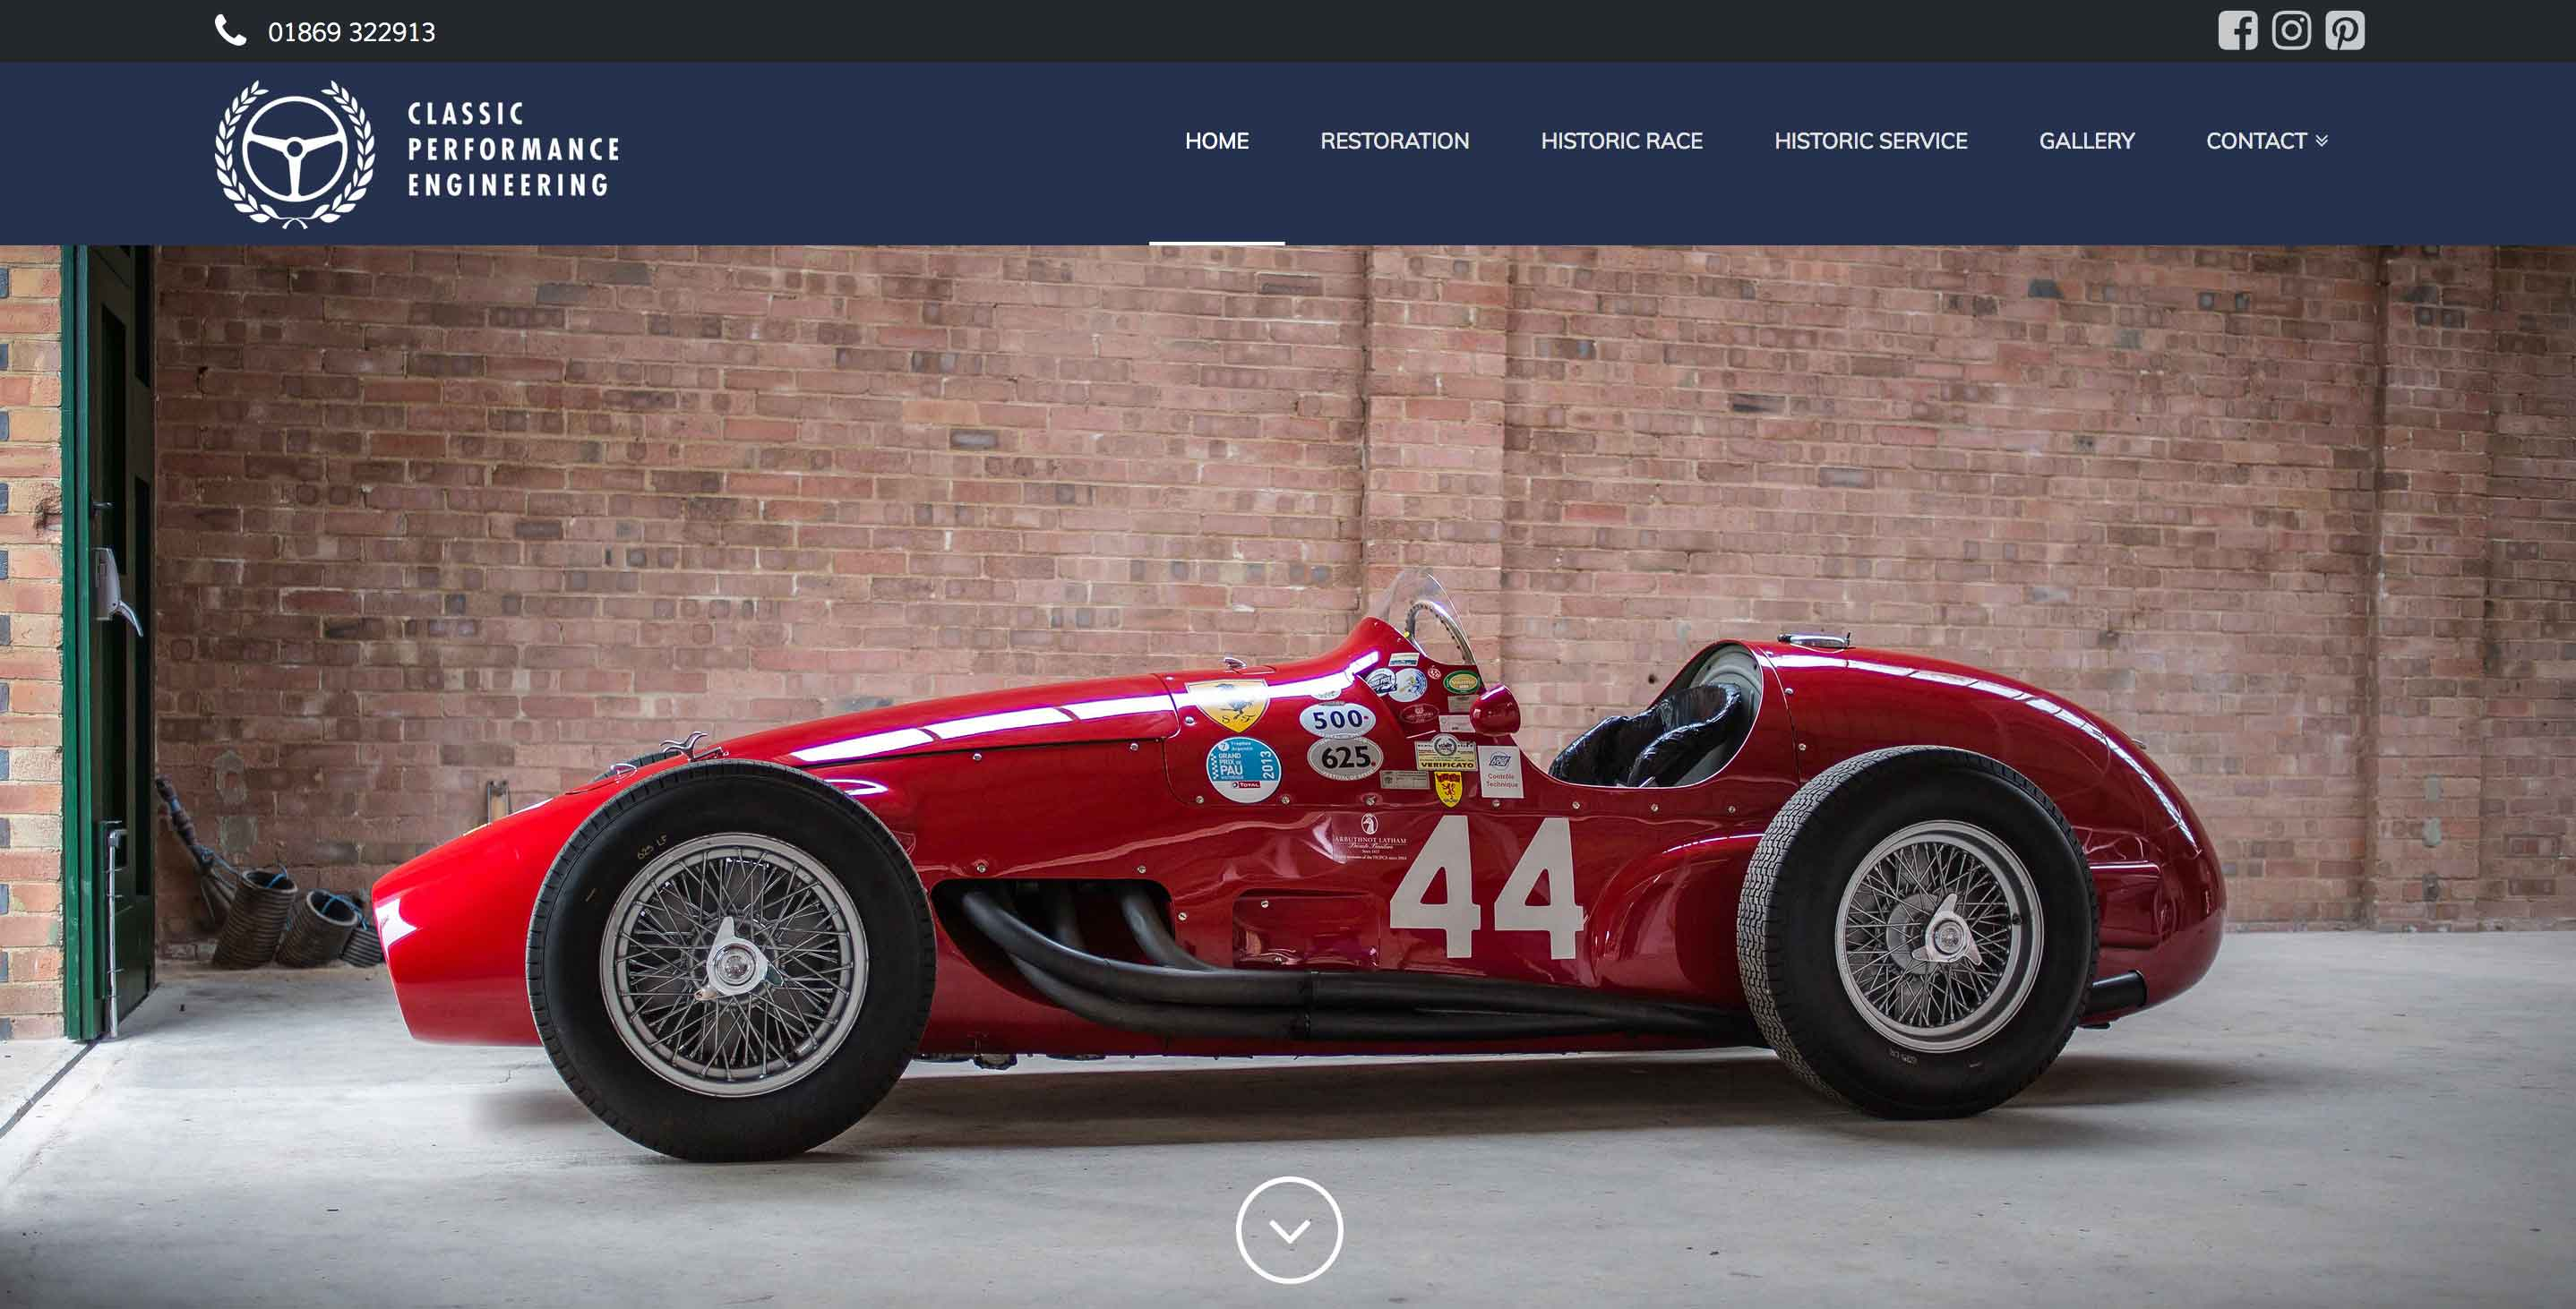 classic performance engineering website screenshot